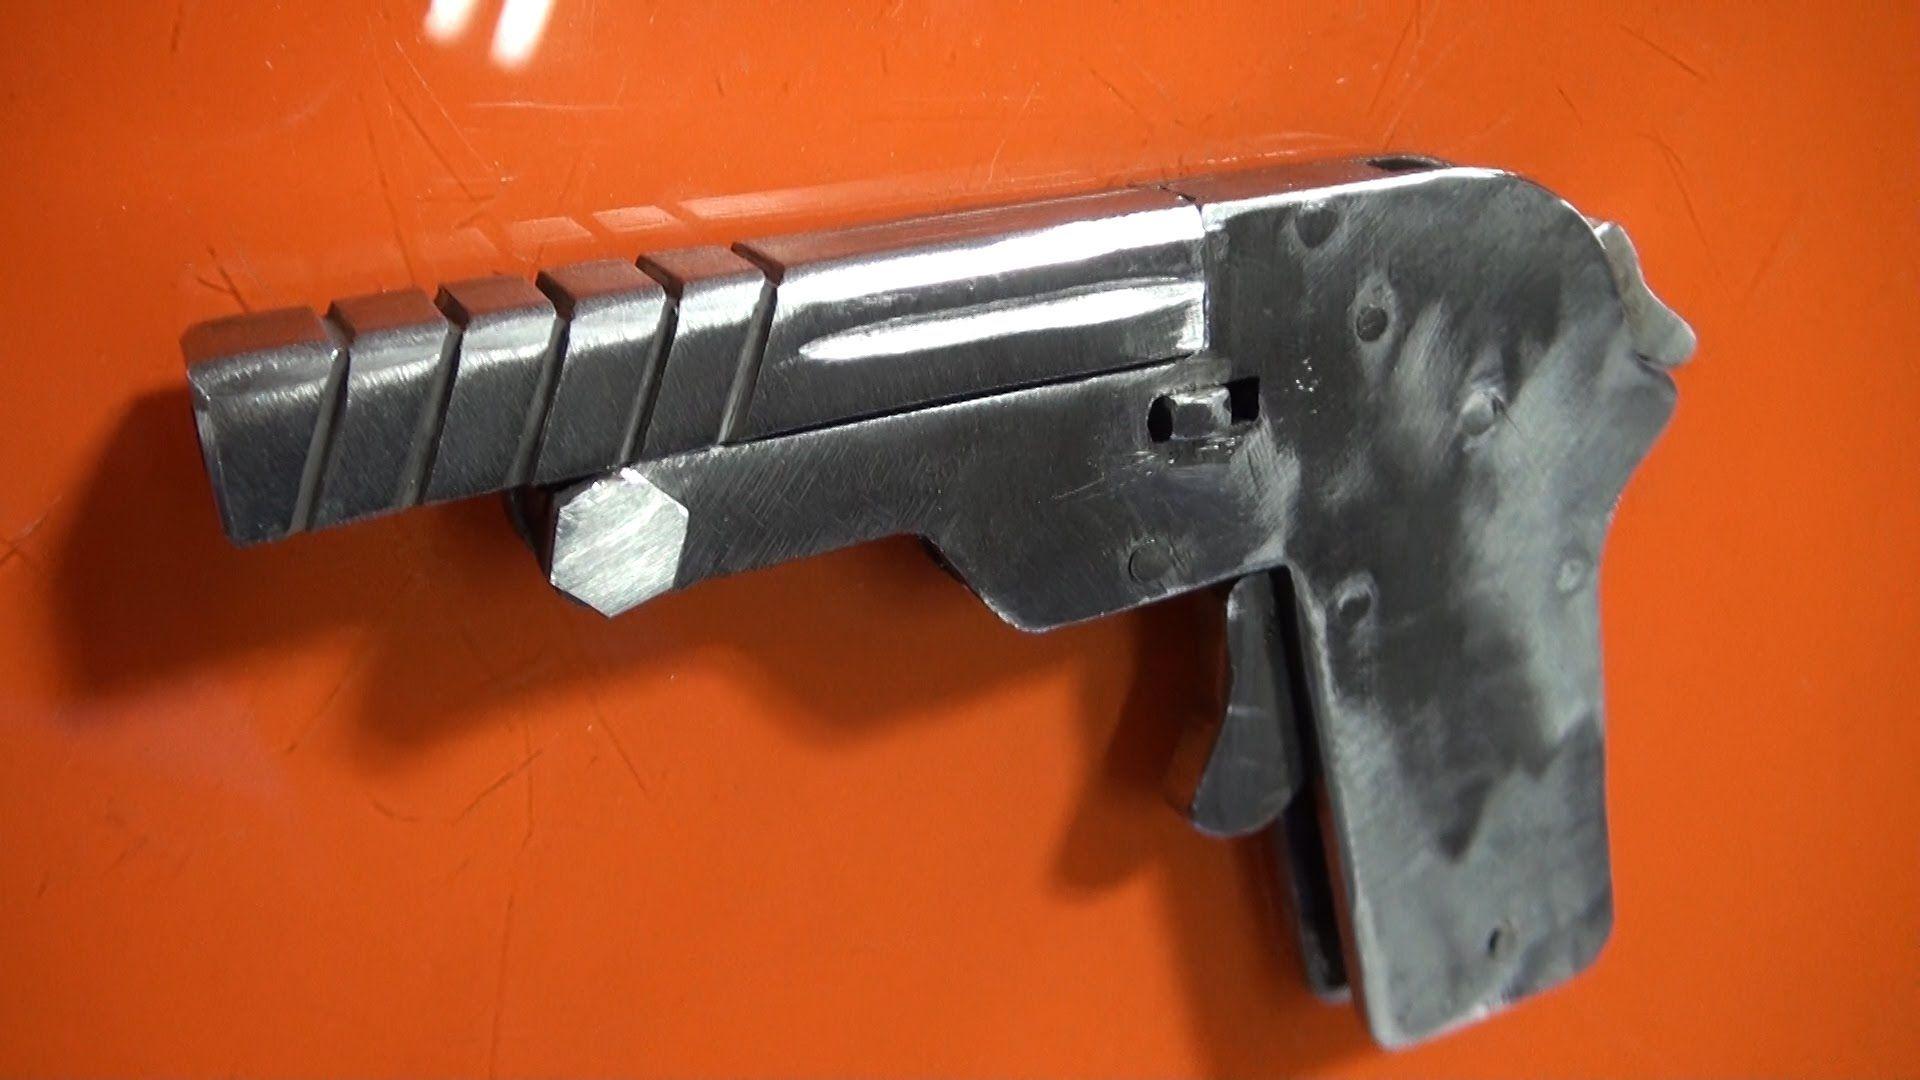 Pistola - mecanismo interior | Арбалеты | Pinterest | Pistola y ...